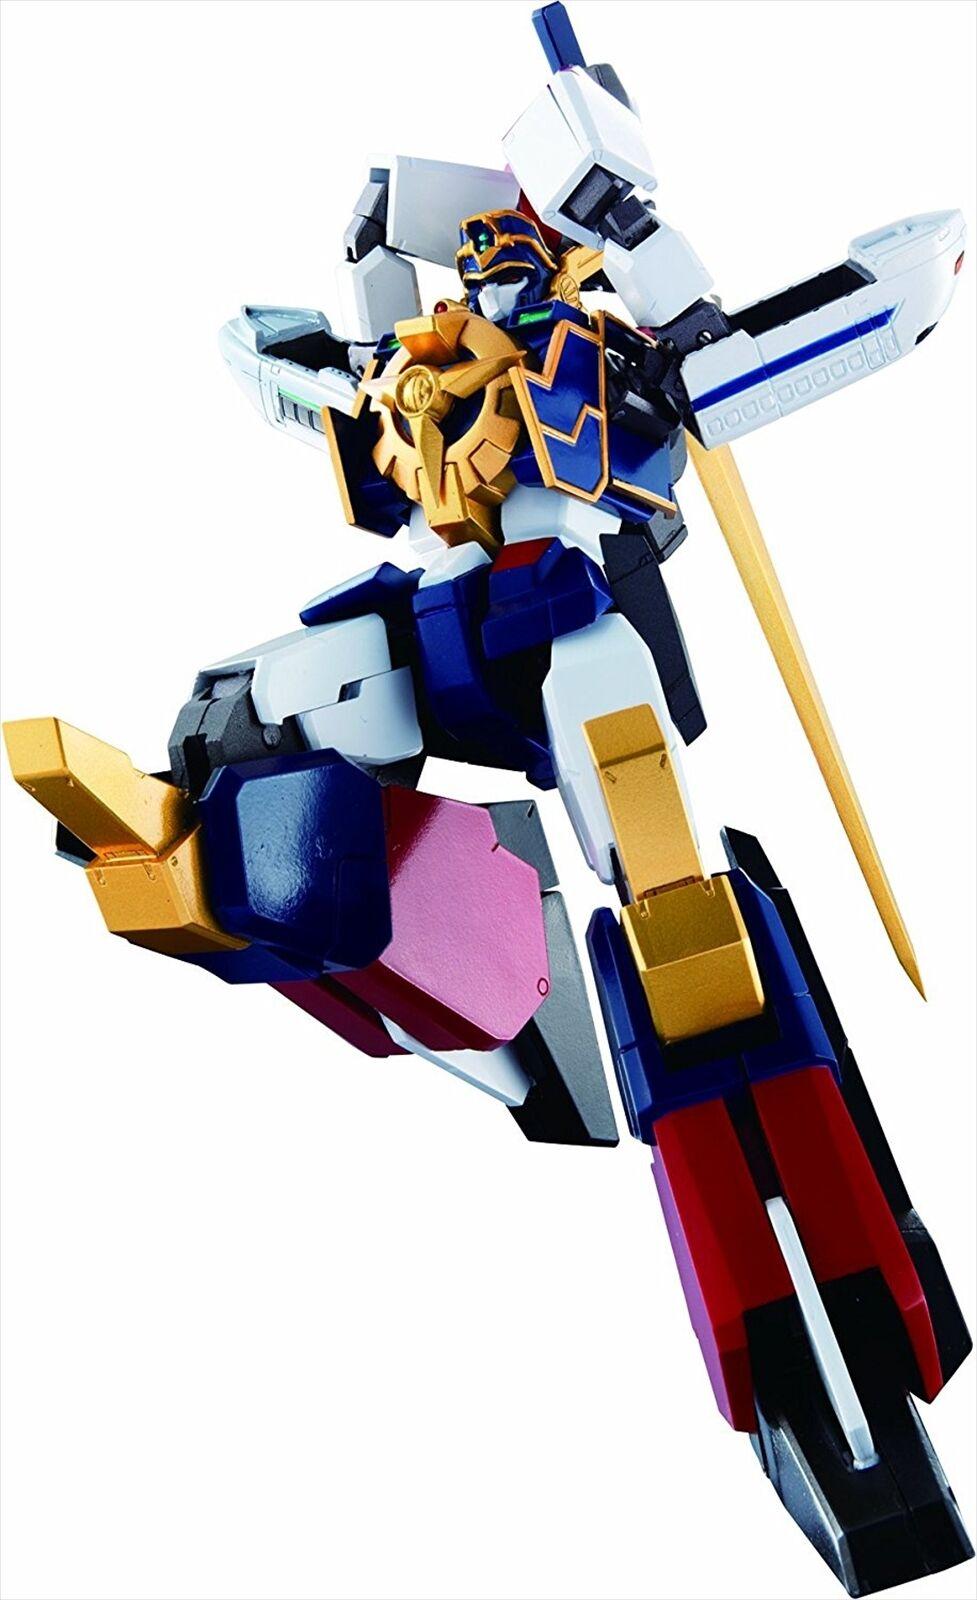 Bandai Super Robot Chogokin Might Gaine Action Figure